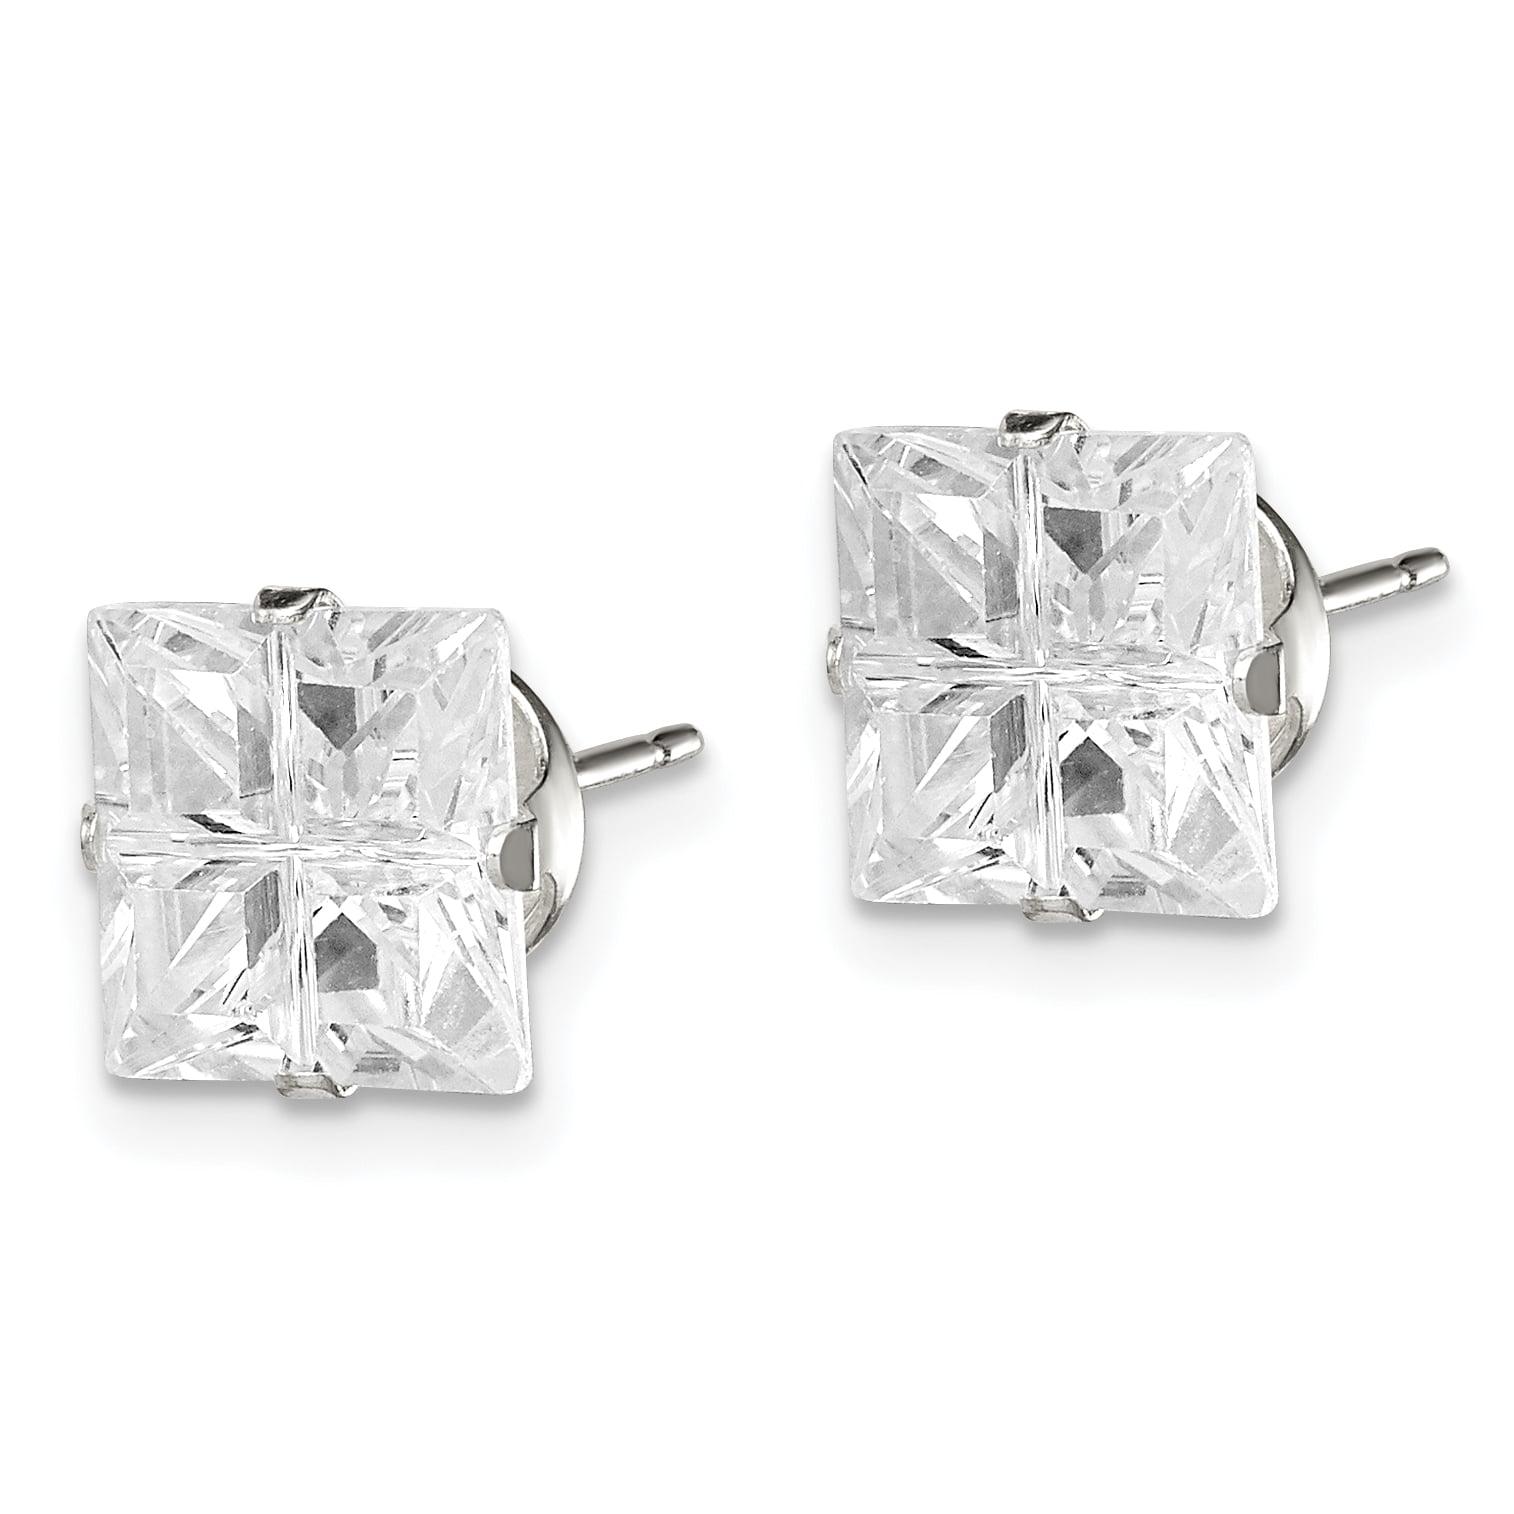 Sterling Silver 5mm Square Snap Set CZ Stud Earrings Snap-in Mounting 5 mm 5 mm Stud Earrings Jewelry